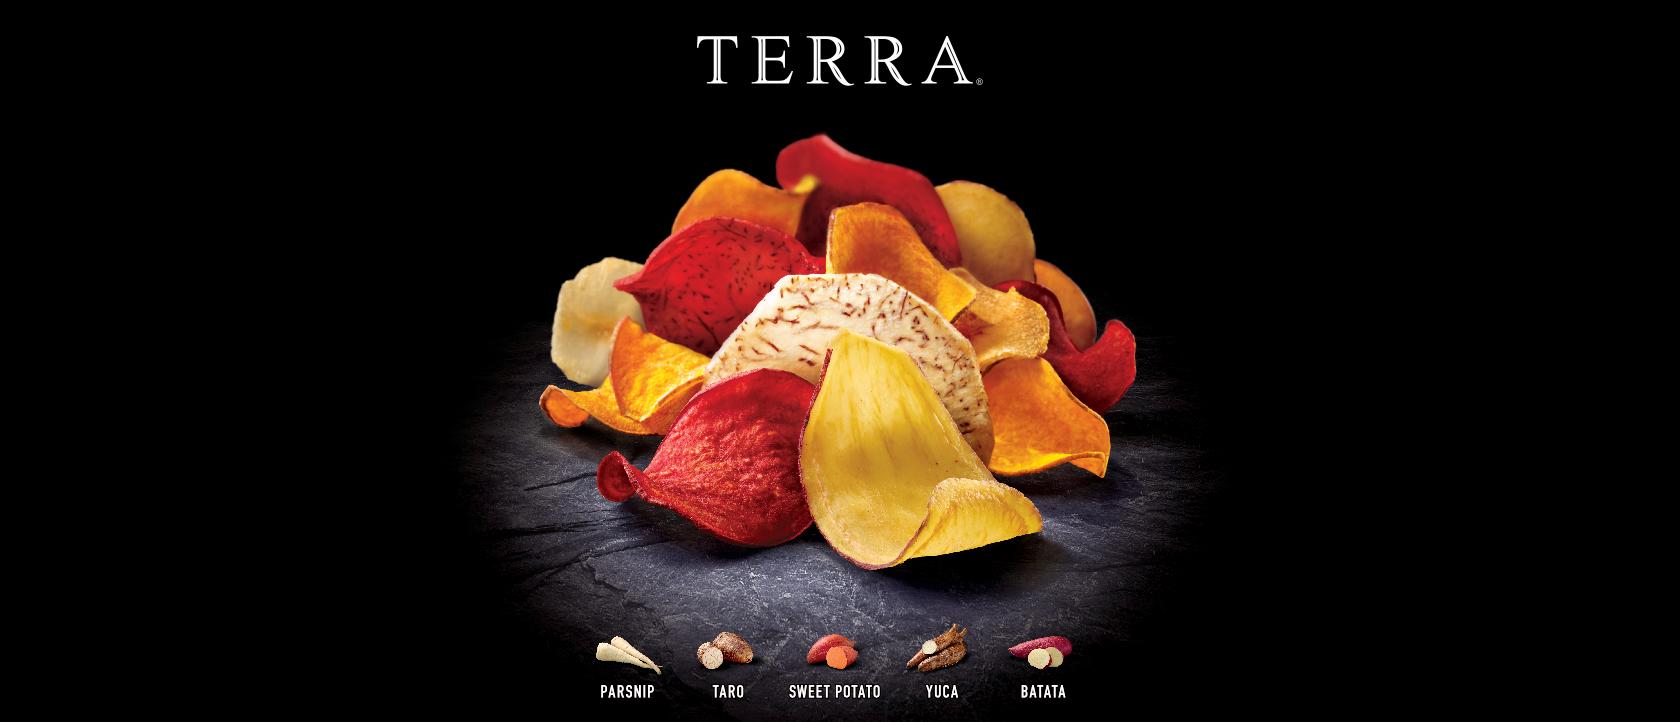 terraheader-copy-001